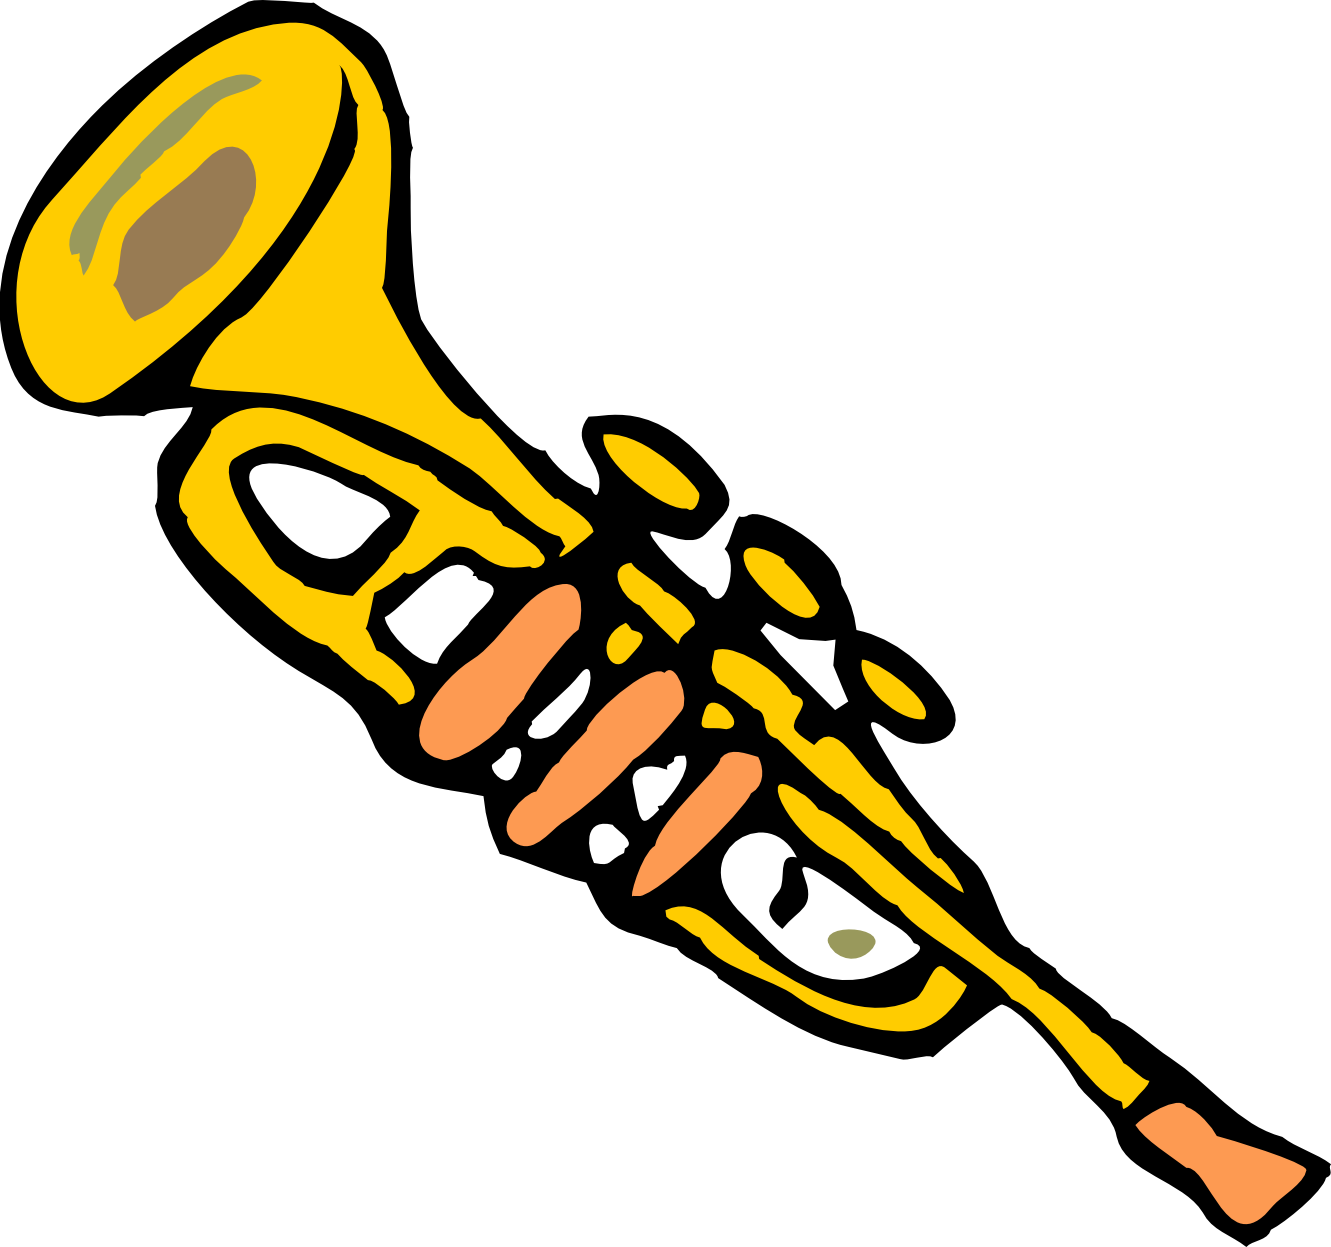 Trumpet Clip Art | Clipart Panda - Free Clipart Images